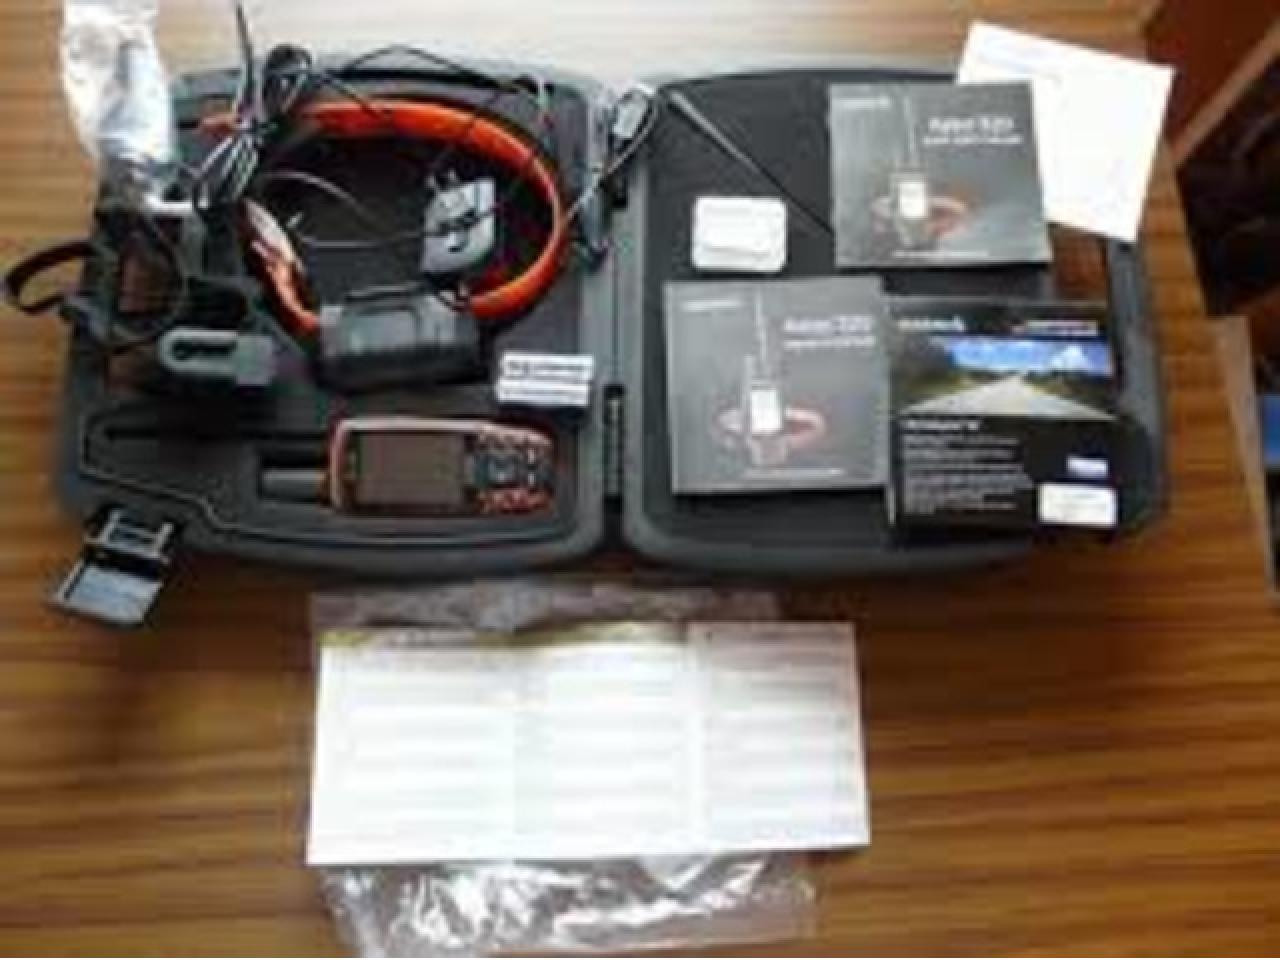 Garmin astro 320 / Alpha 100 / Sportdog Tek 2.0 Handheld with dc 30 DC40 DC50 T5. TT15 Ошейники ETC. - 1